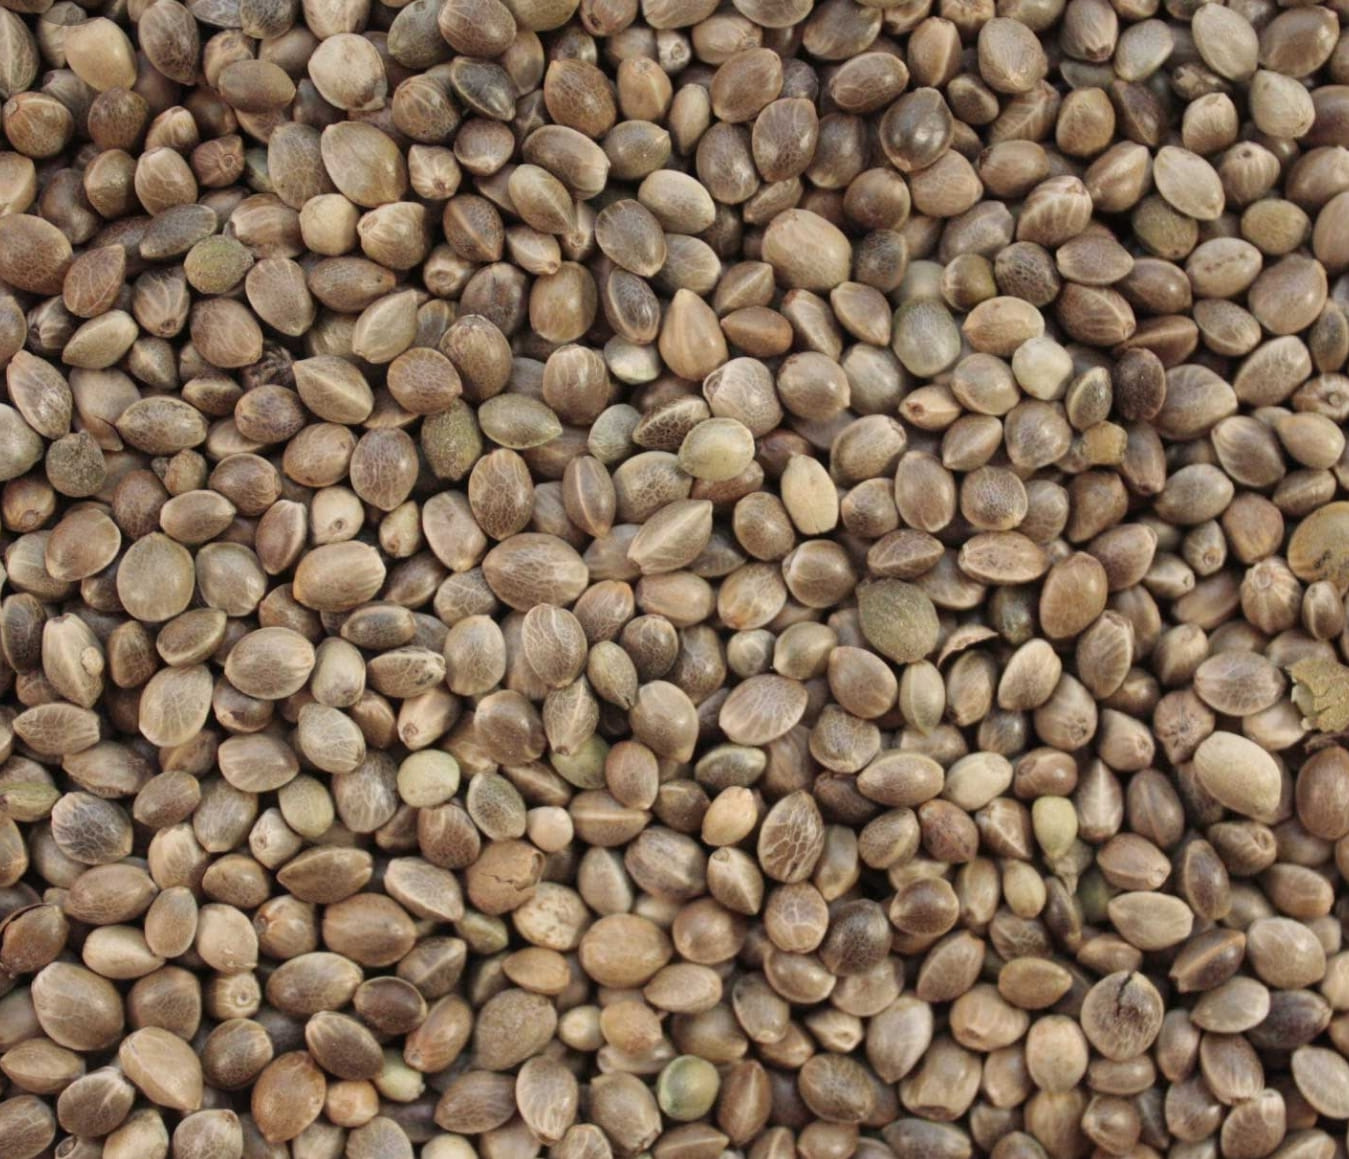 Hemp Seed Genetics - CBD, Grain, FibreBenefits: High in Absorable Proteins, Omega Oils, Fibre, Essential Minerals & Vitamins, GMO Free, Pesticide Free, Nut Free, Gluten Free, Dairy FreeUses: Planting, Food,